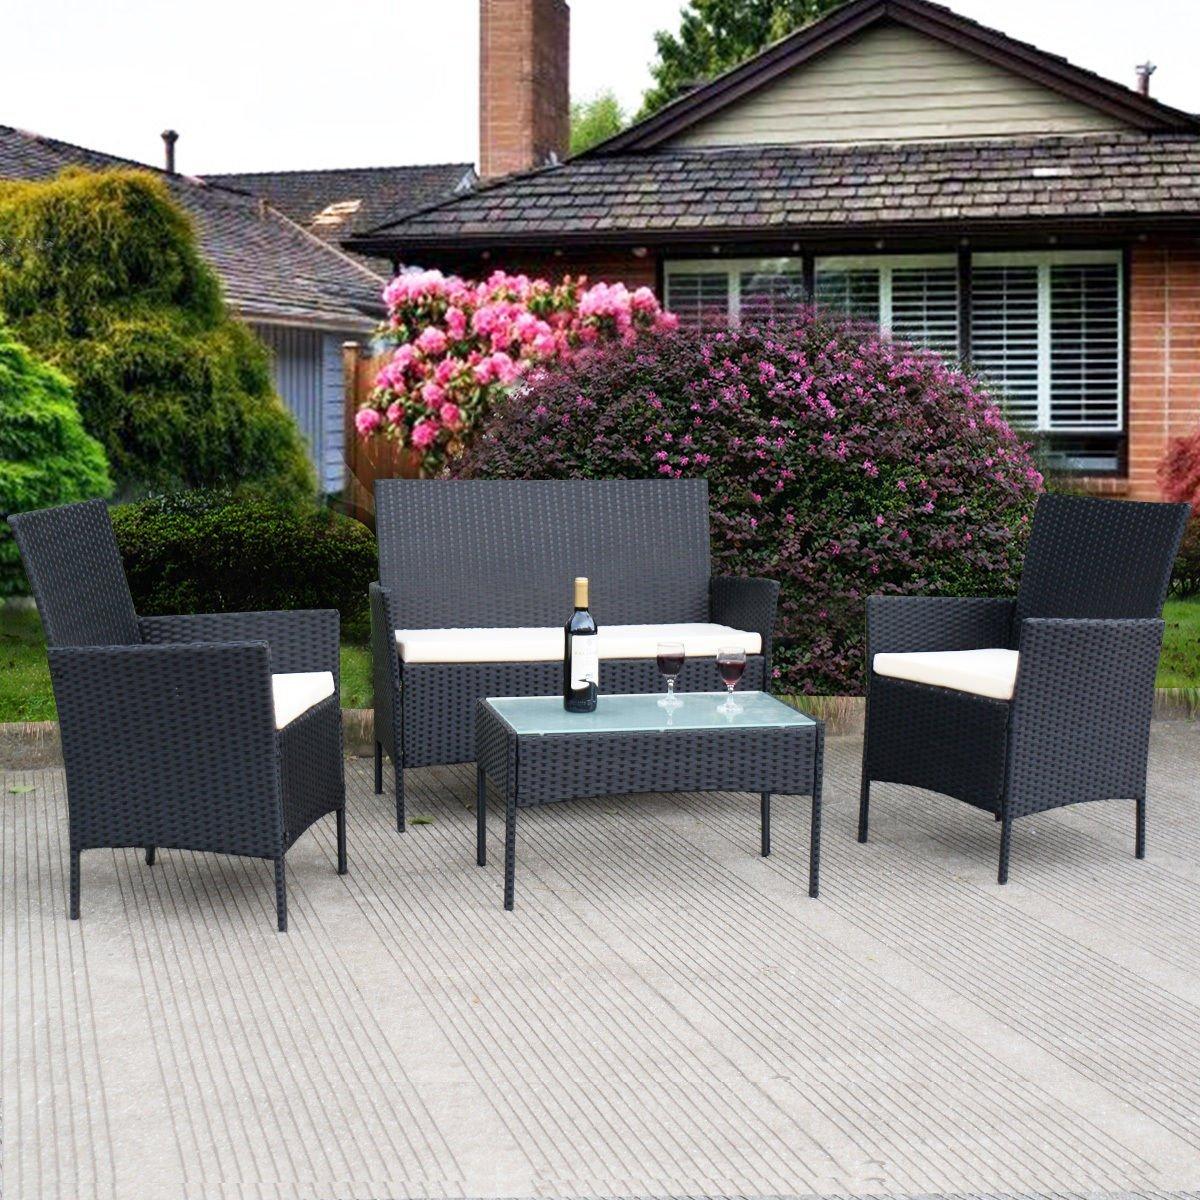 Tangkula 4 pcs Wicker Furniture Set Rattan Sofas Garden Lawn Patio Furniture by Tangkula